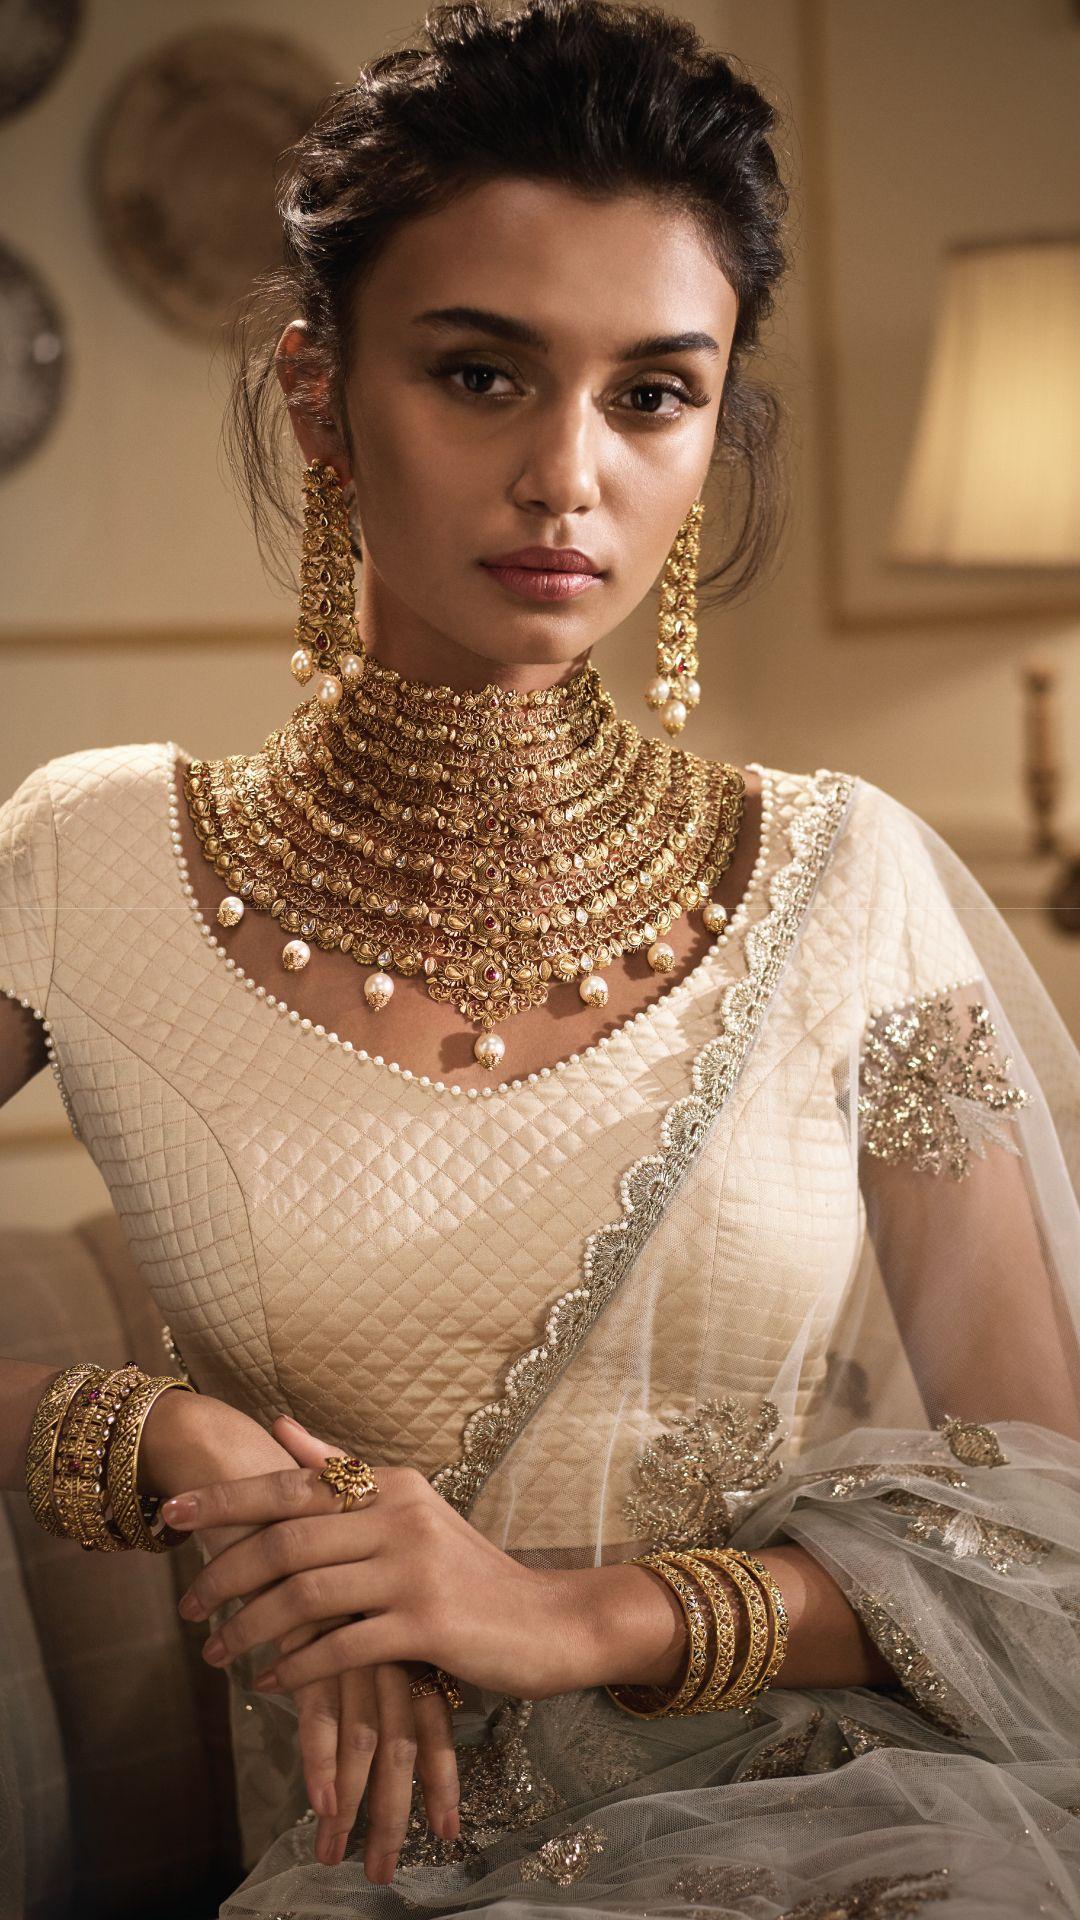 Pin by kiran bhardwaj on jewellry pinterest contemporary style